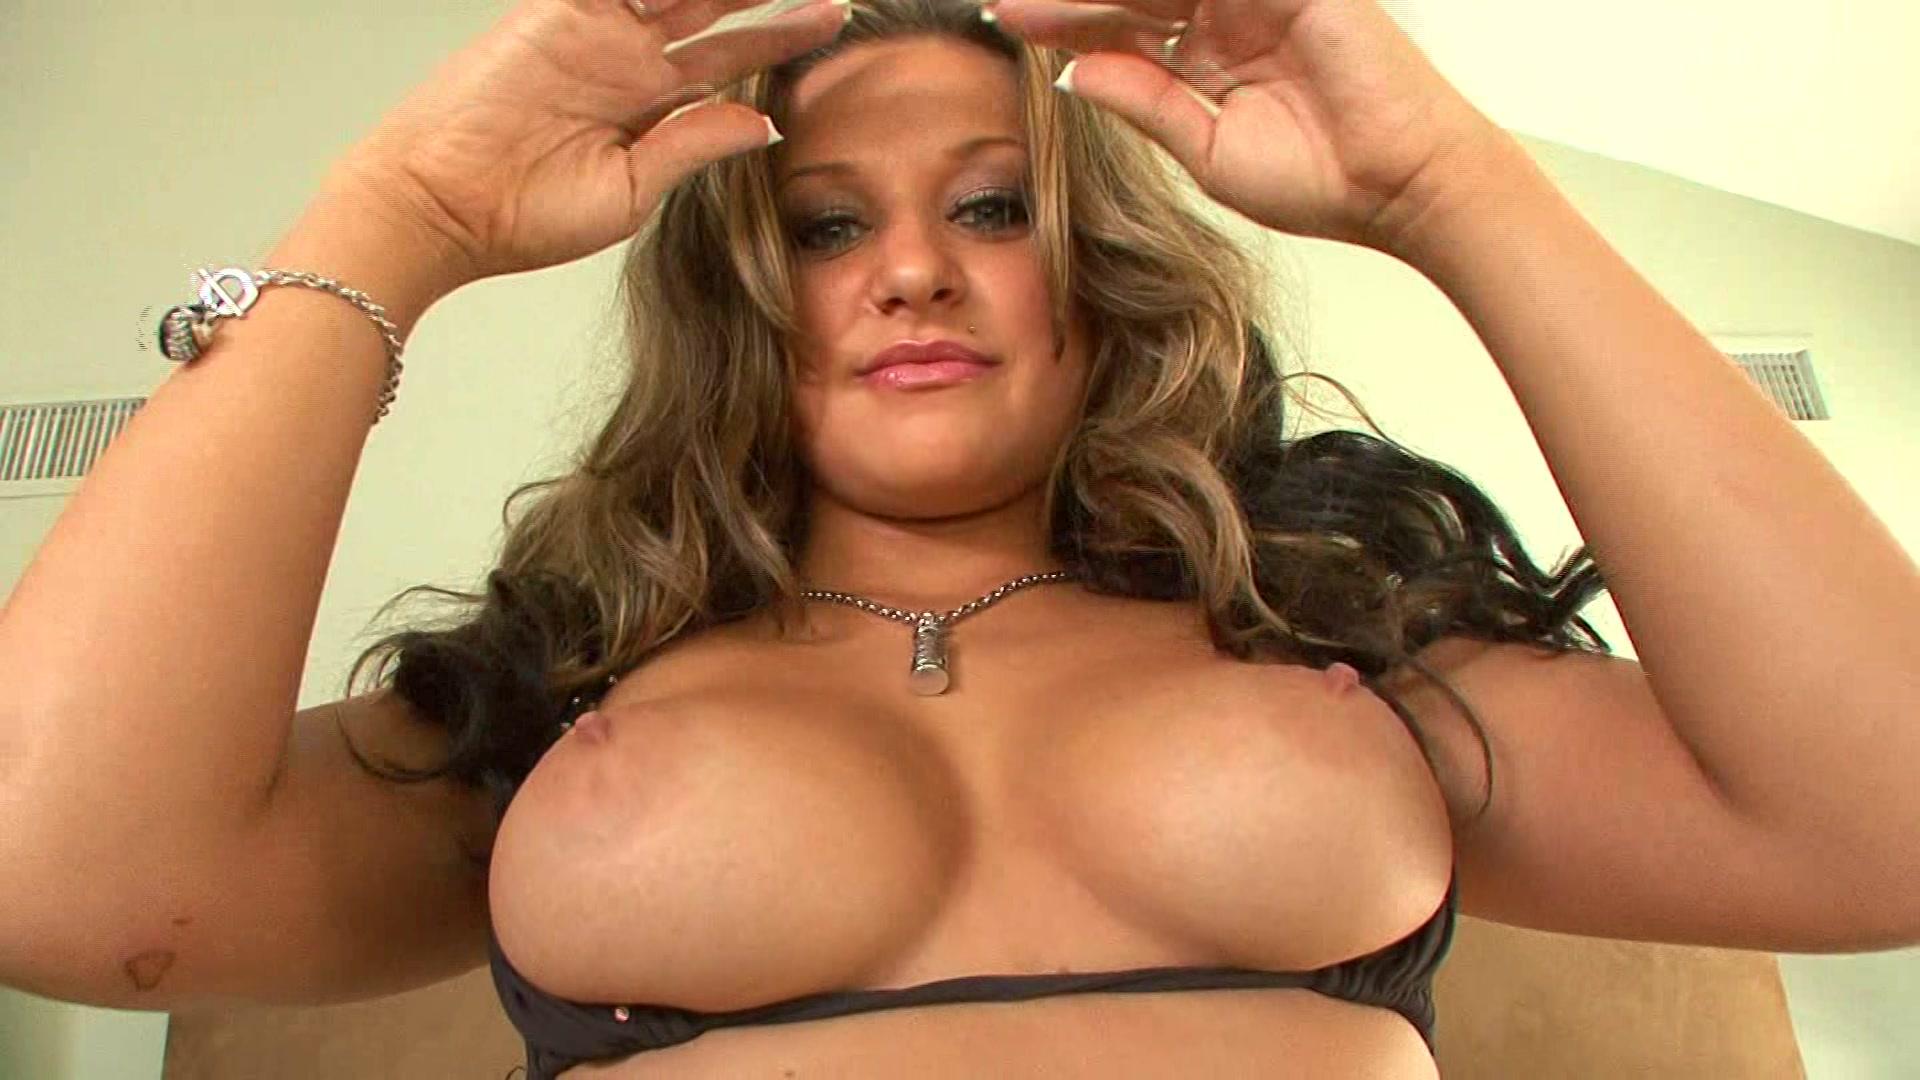 Love softly tits